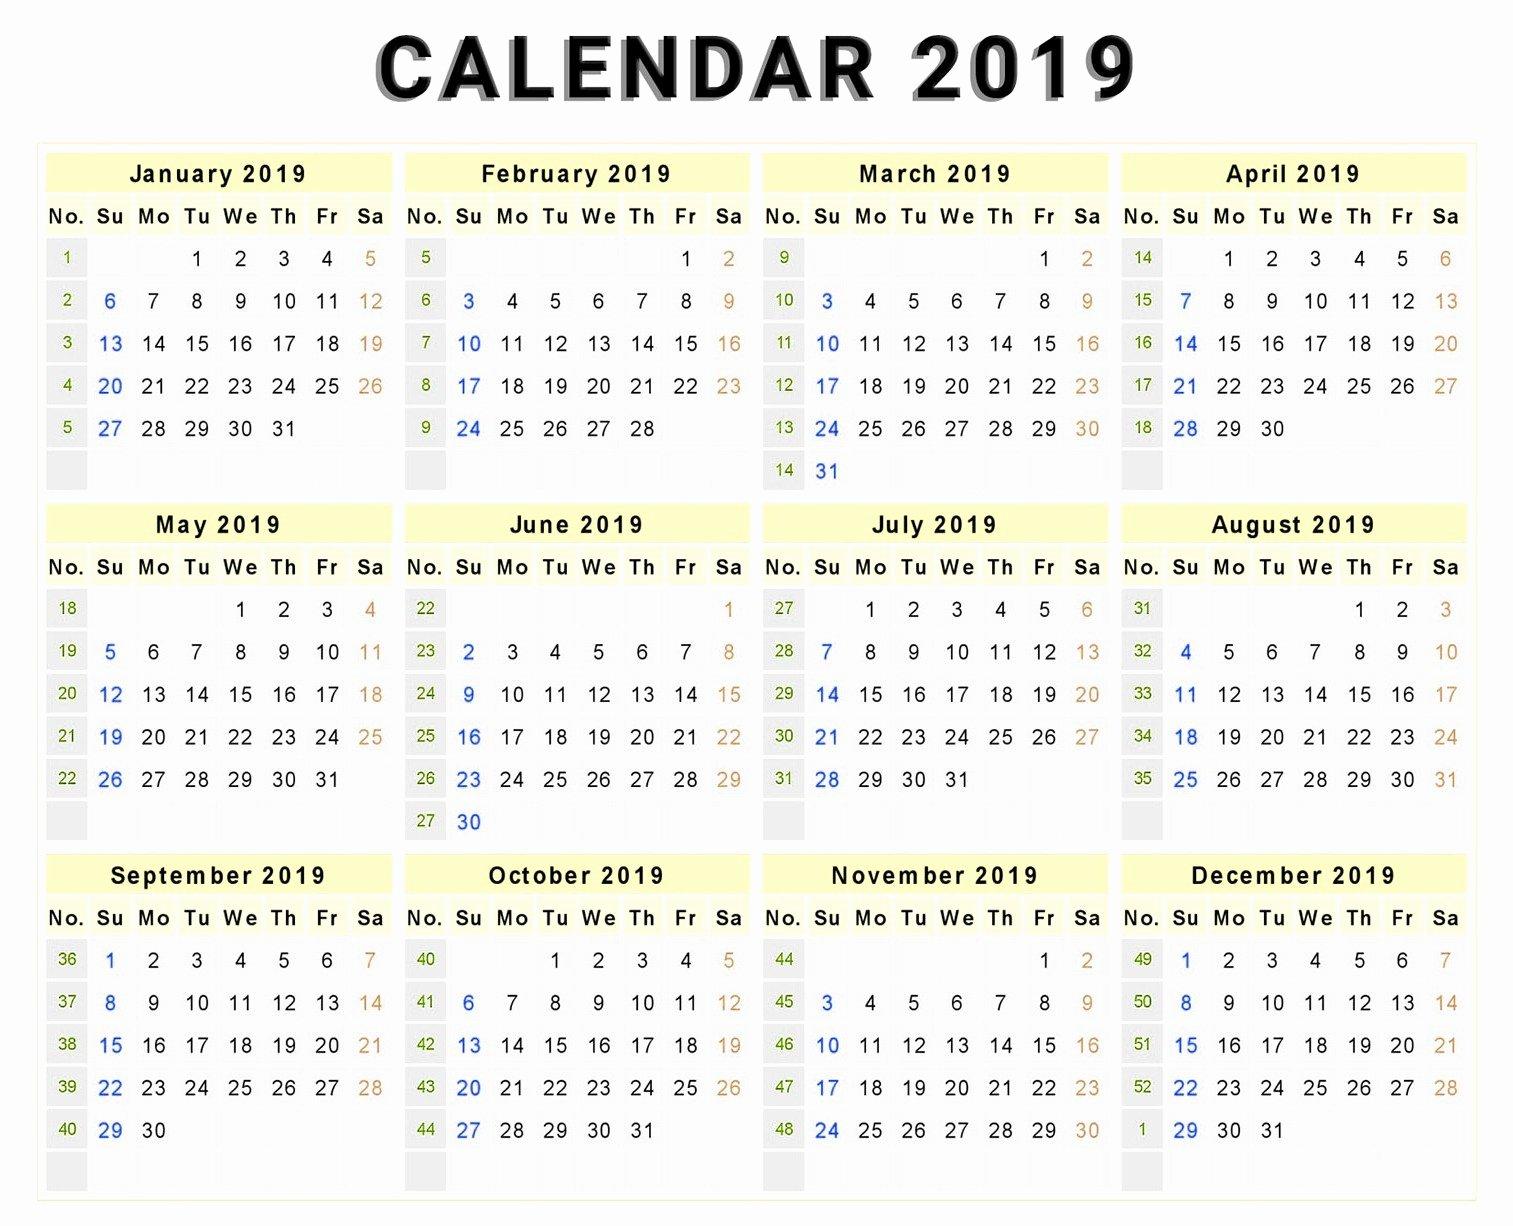 Microsoft Calendar Templates 2019 Unique 2019 Calendar Year at A Glance Printable